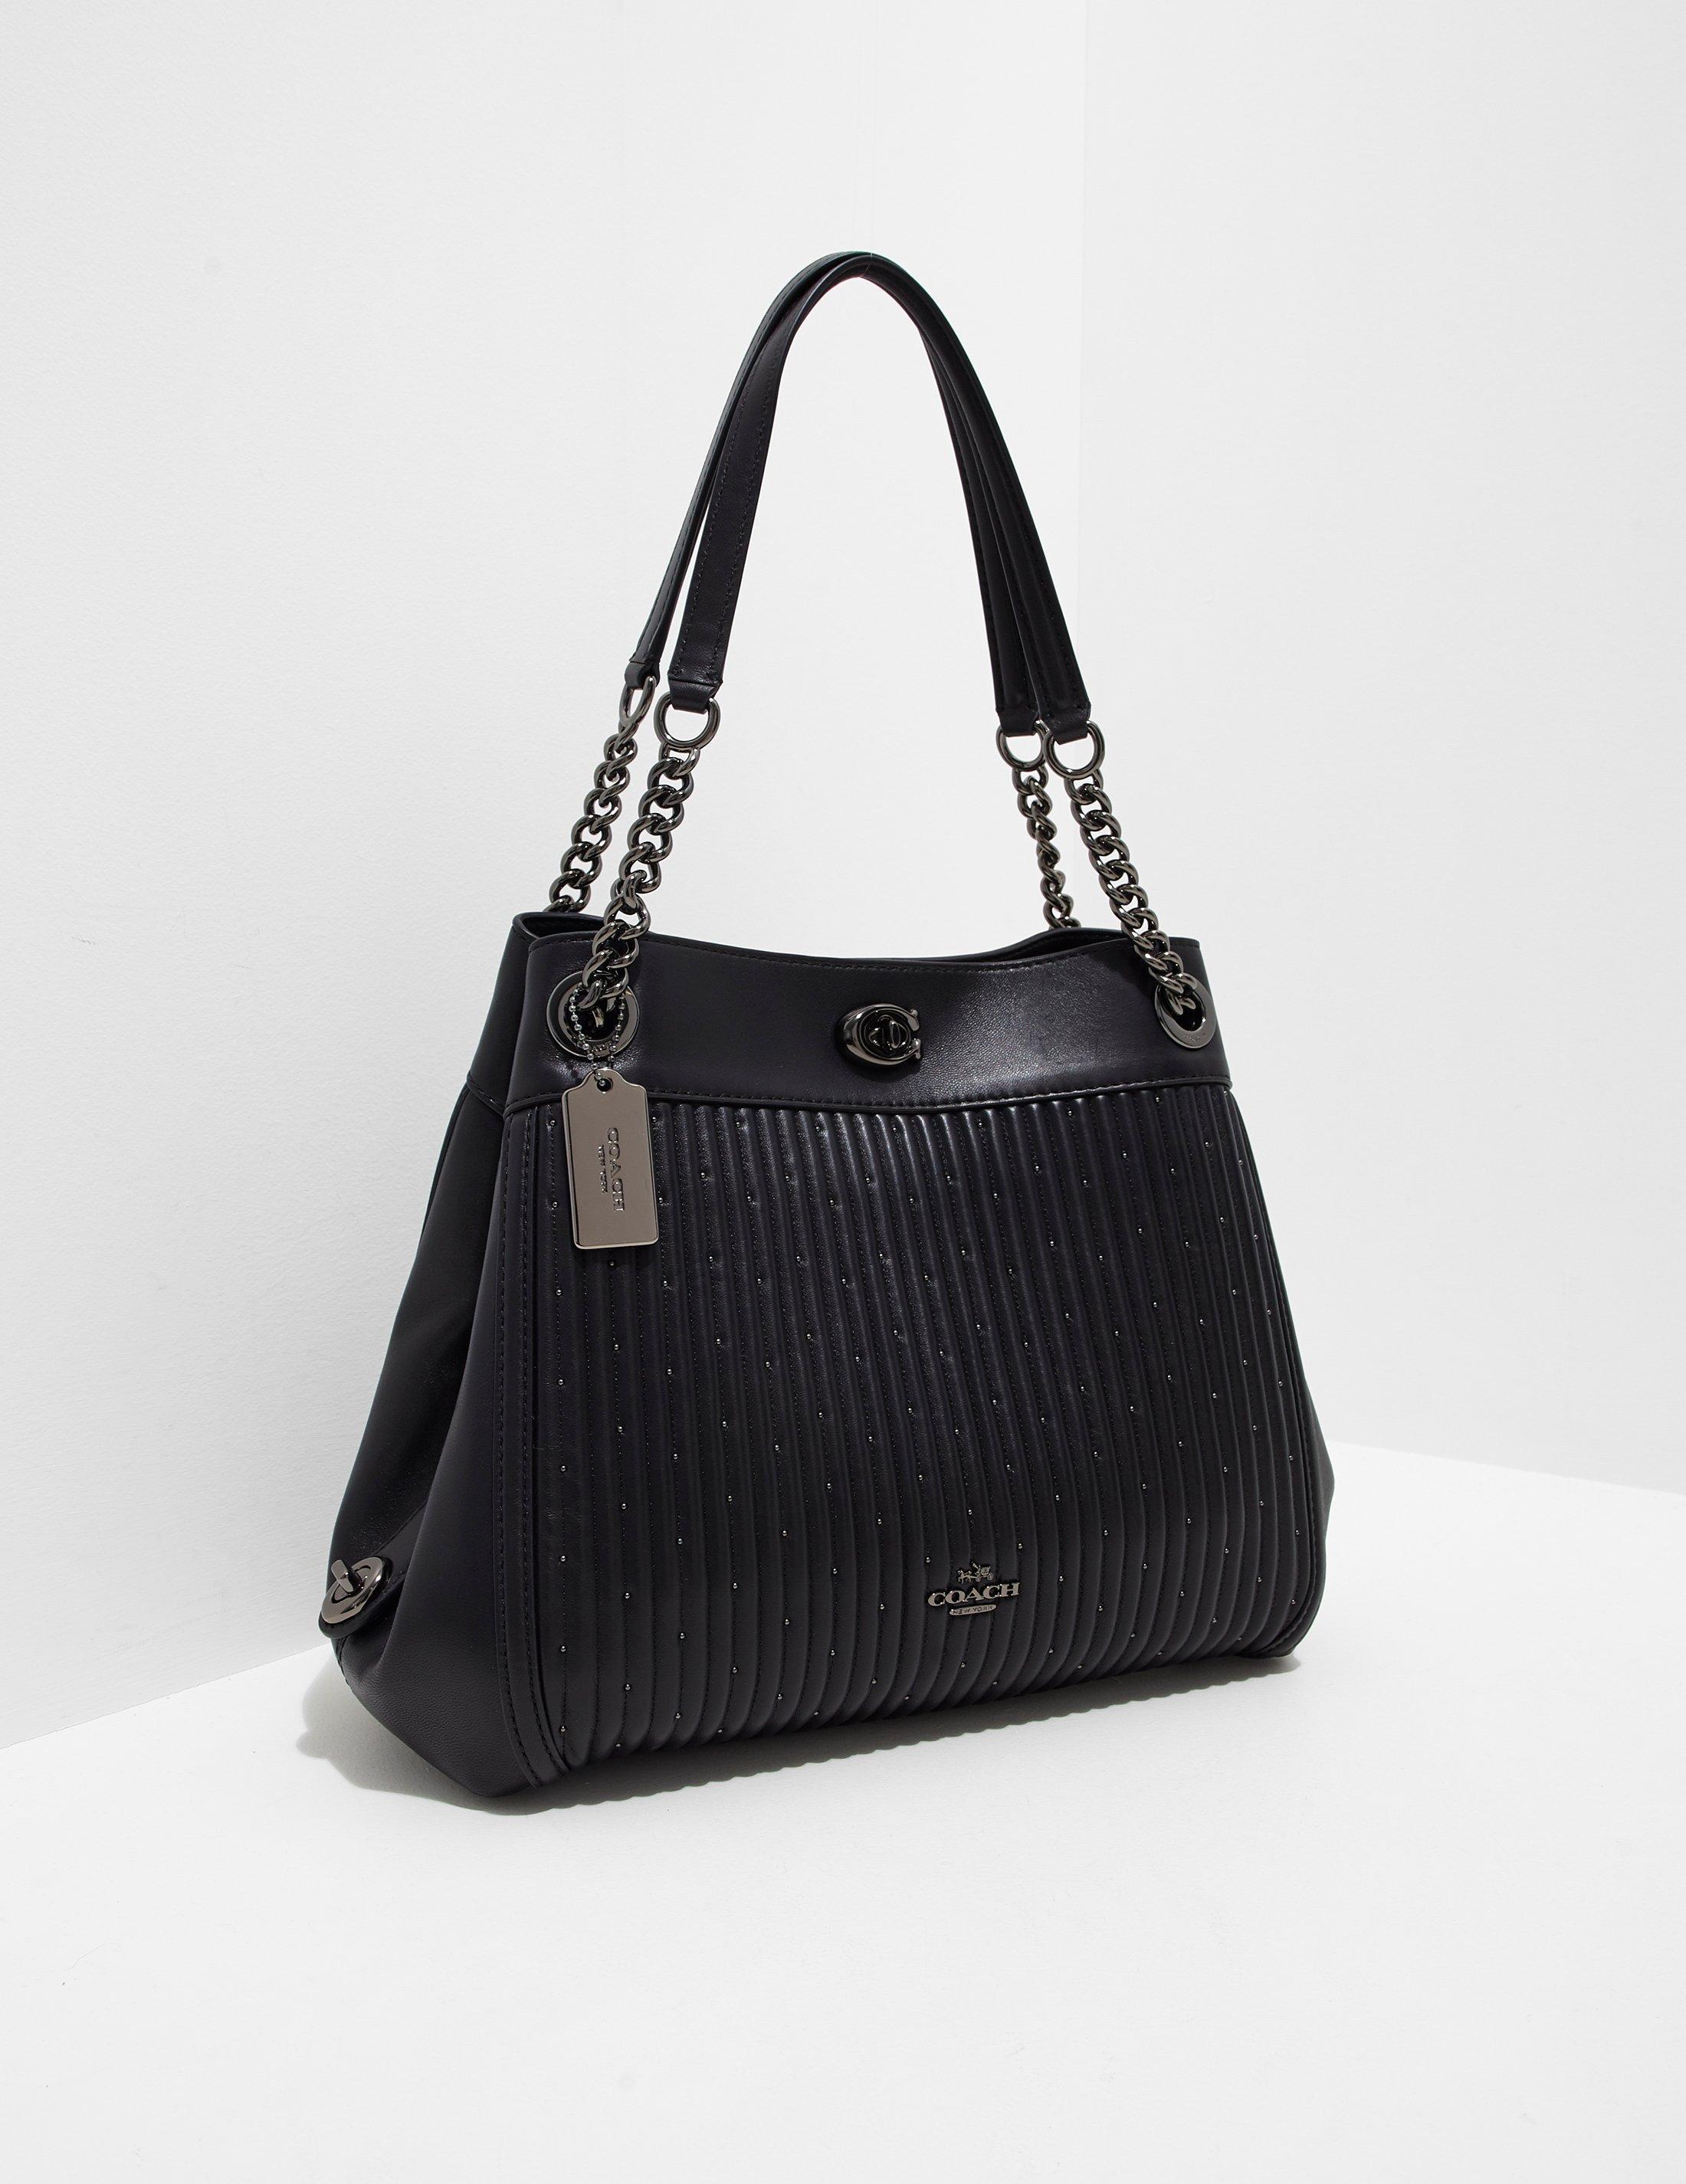 ... closeout coach womens turnlock edie chain bag black in black lyst 3dac3  9502f 9f9f7ee4276fb